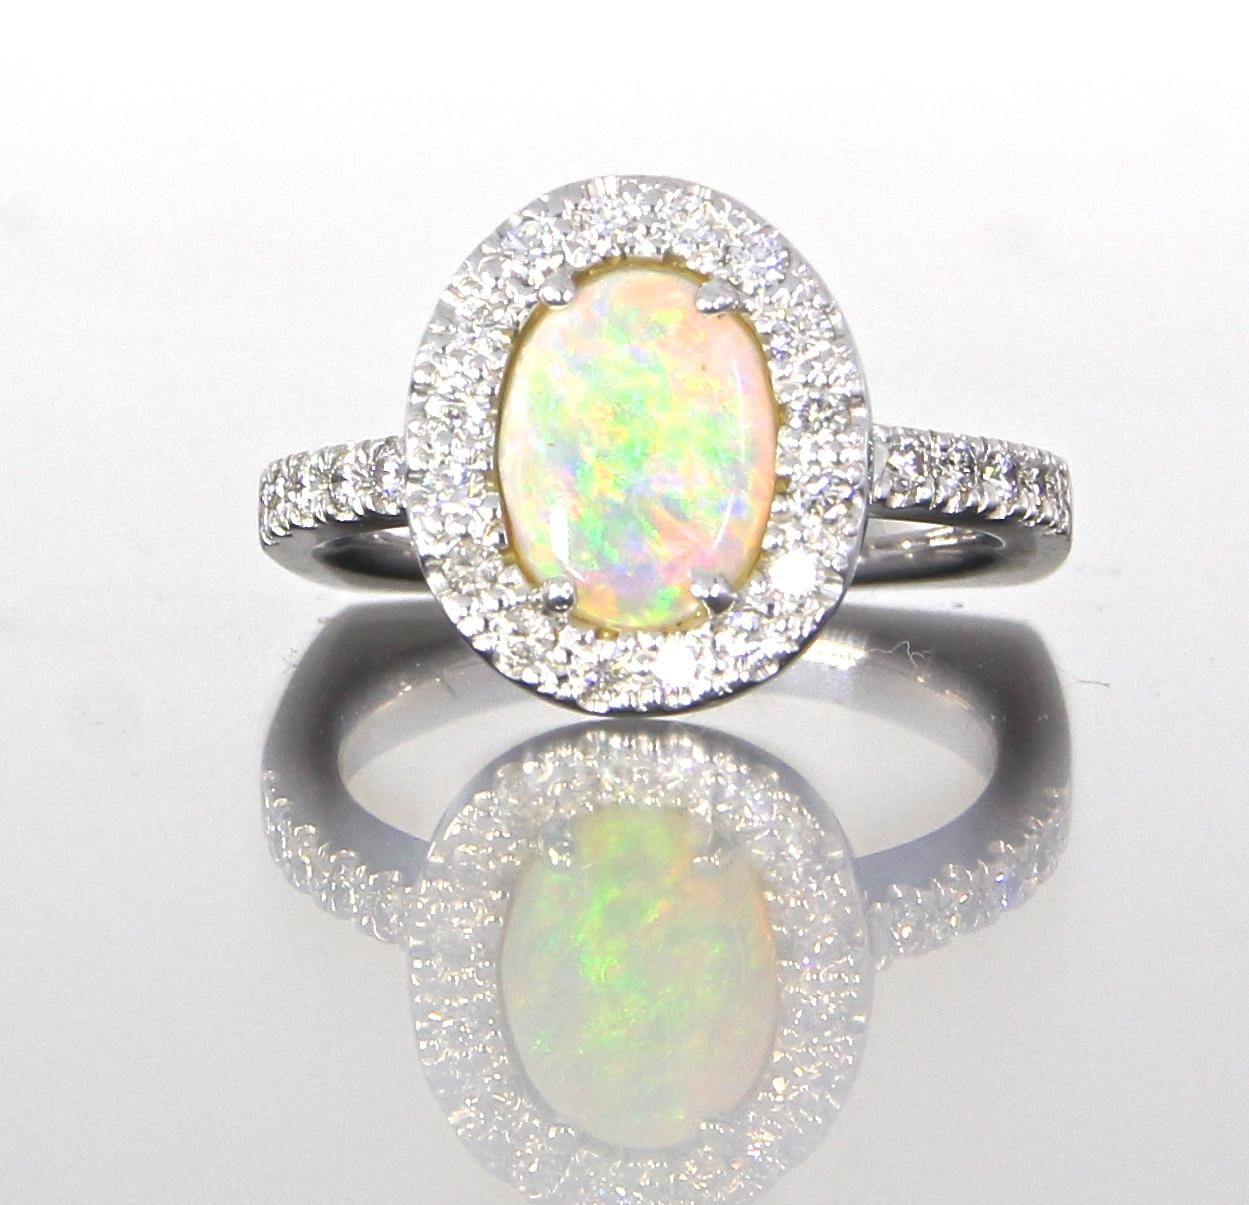 ethiopian-opal-diamond-halo-ring-craft-revival-jewelry-store-grand-rapids.jpg